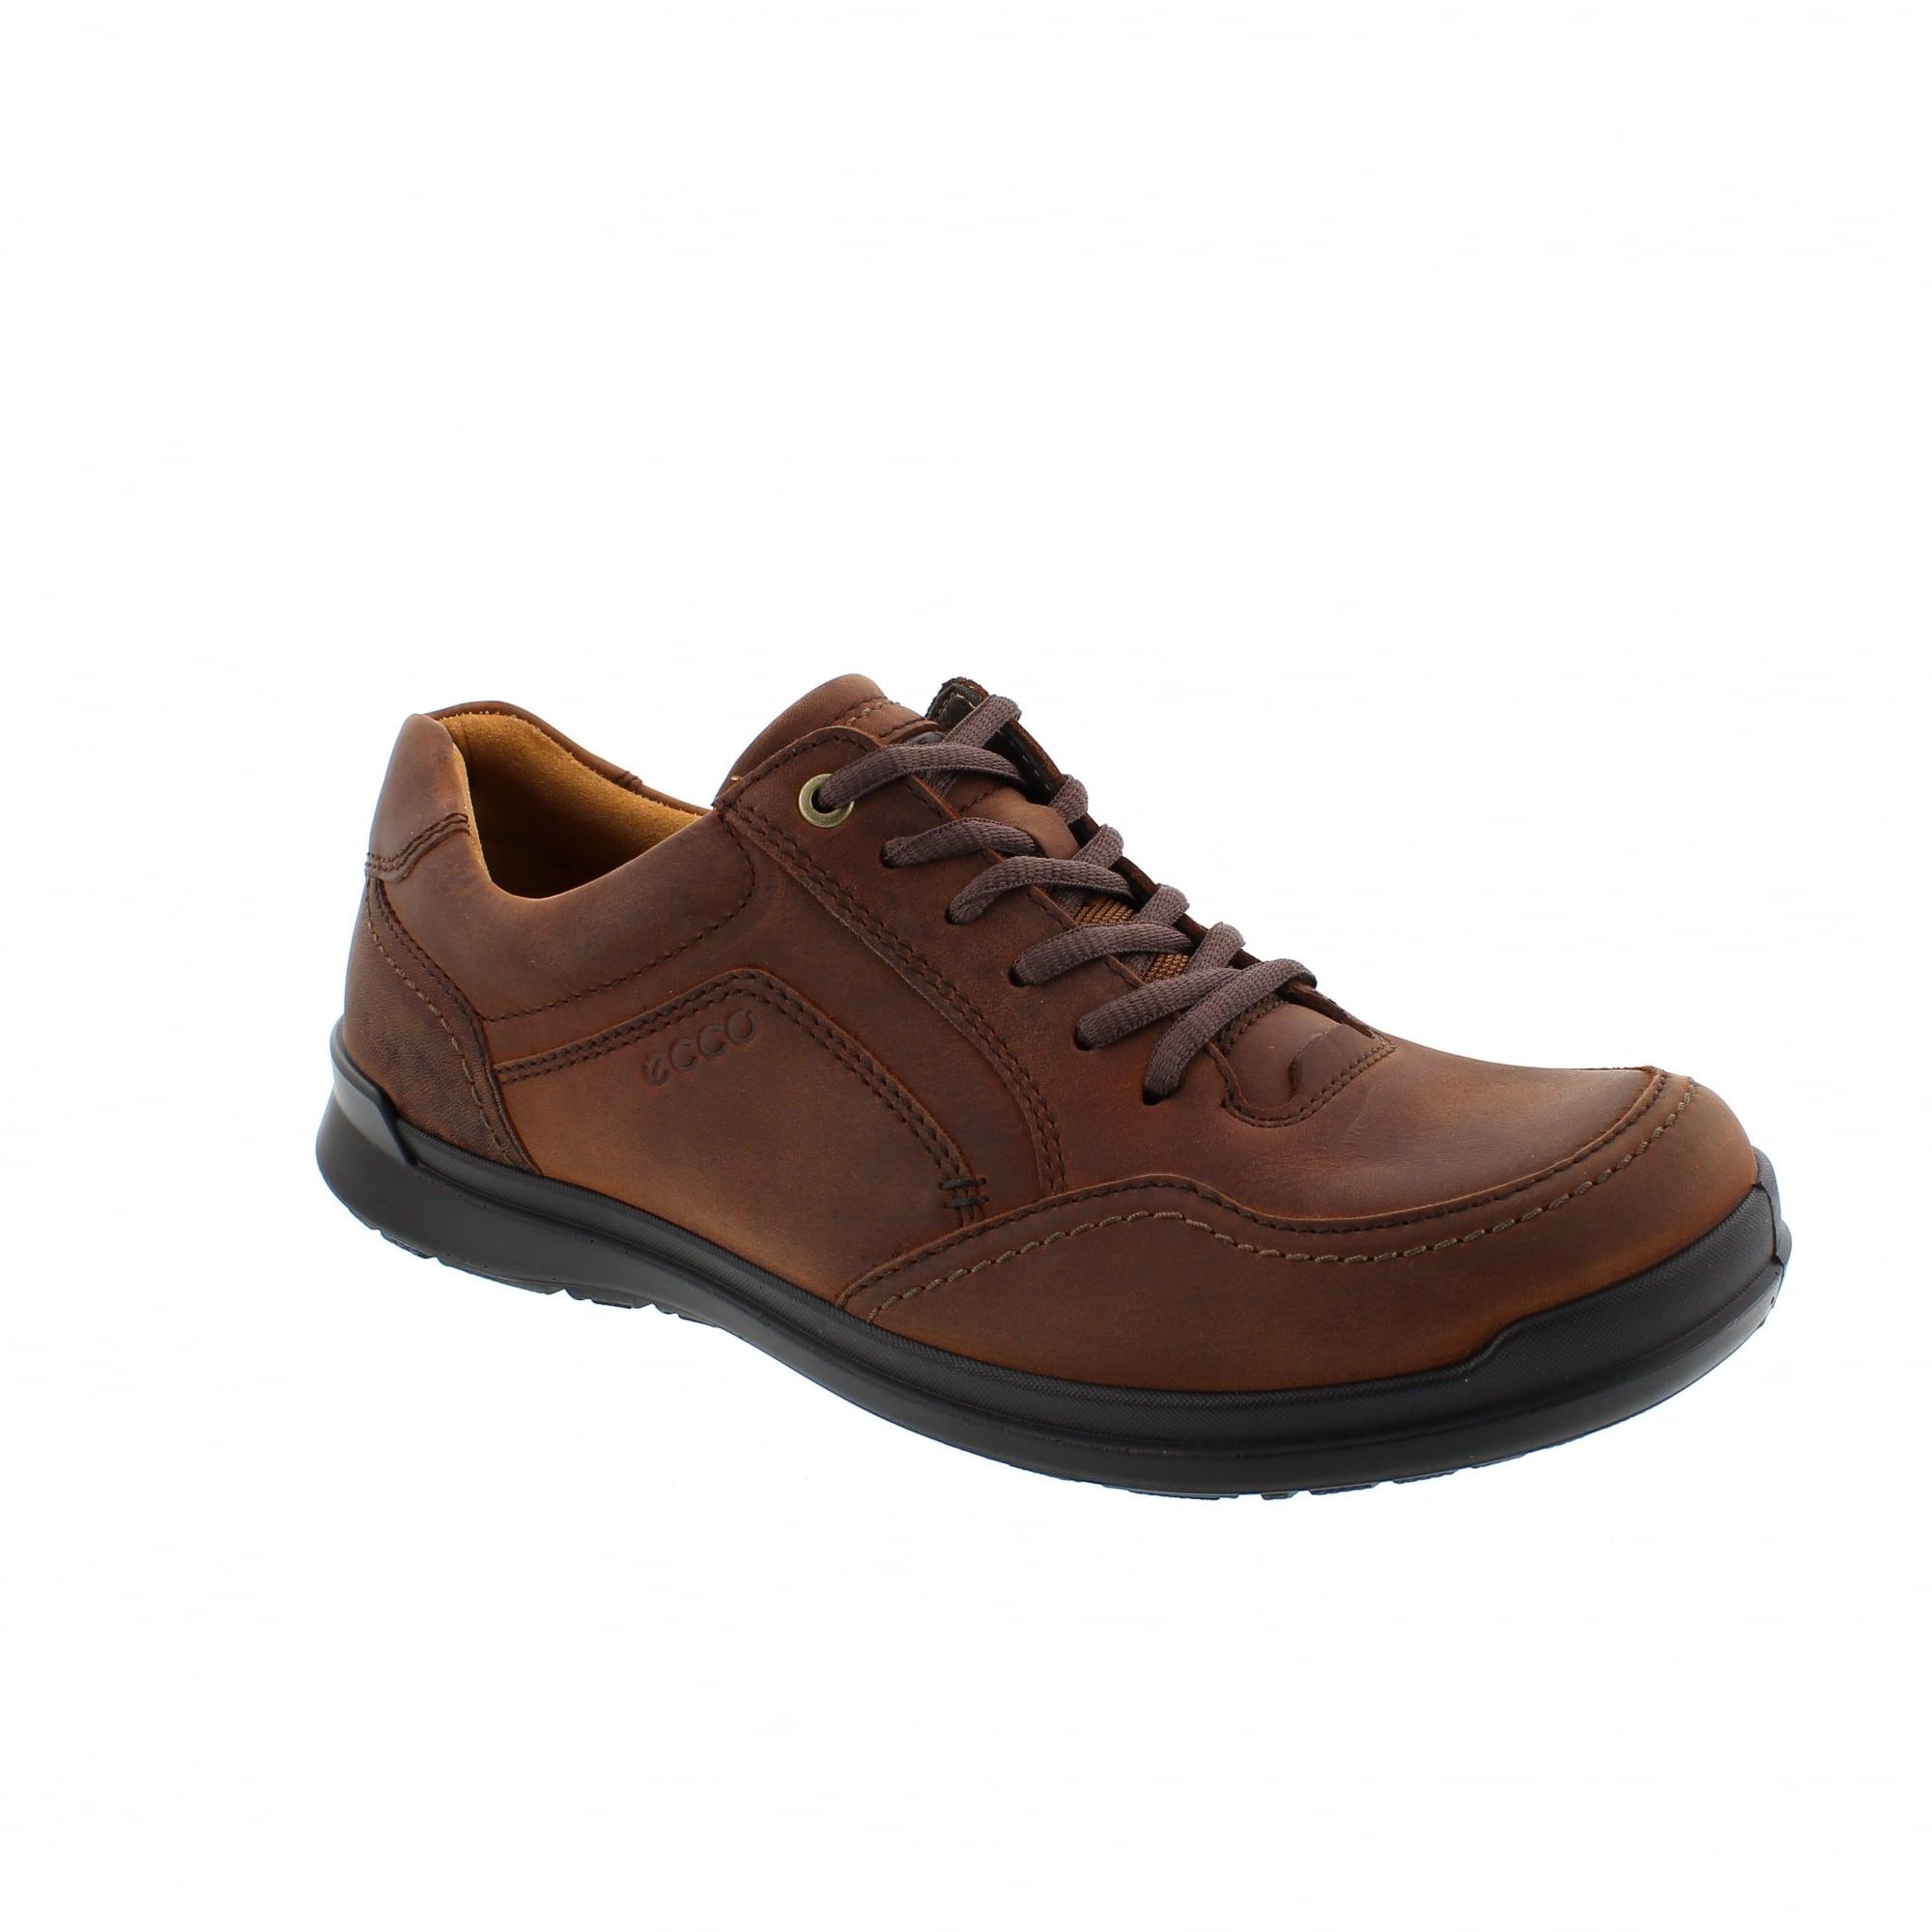 Ecco Howell 524534-02053 Mens Shoes